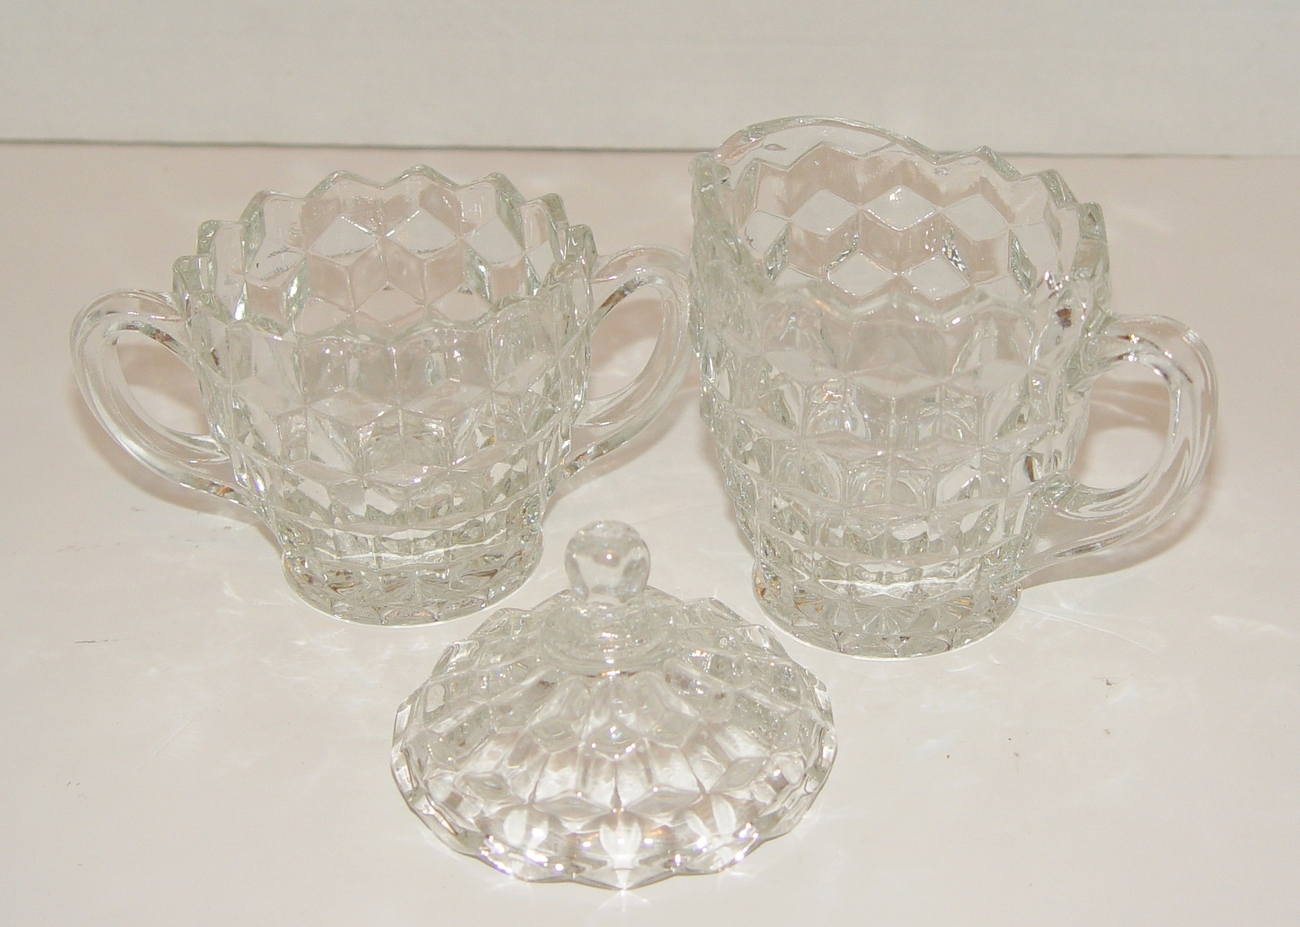 Indiana Glass American Whitehall Clear Glass Creamer & Sugar Bowl W Lid MIB